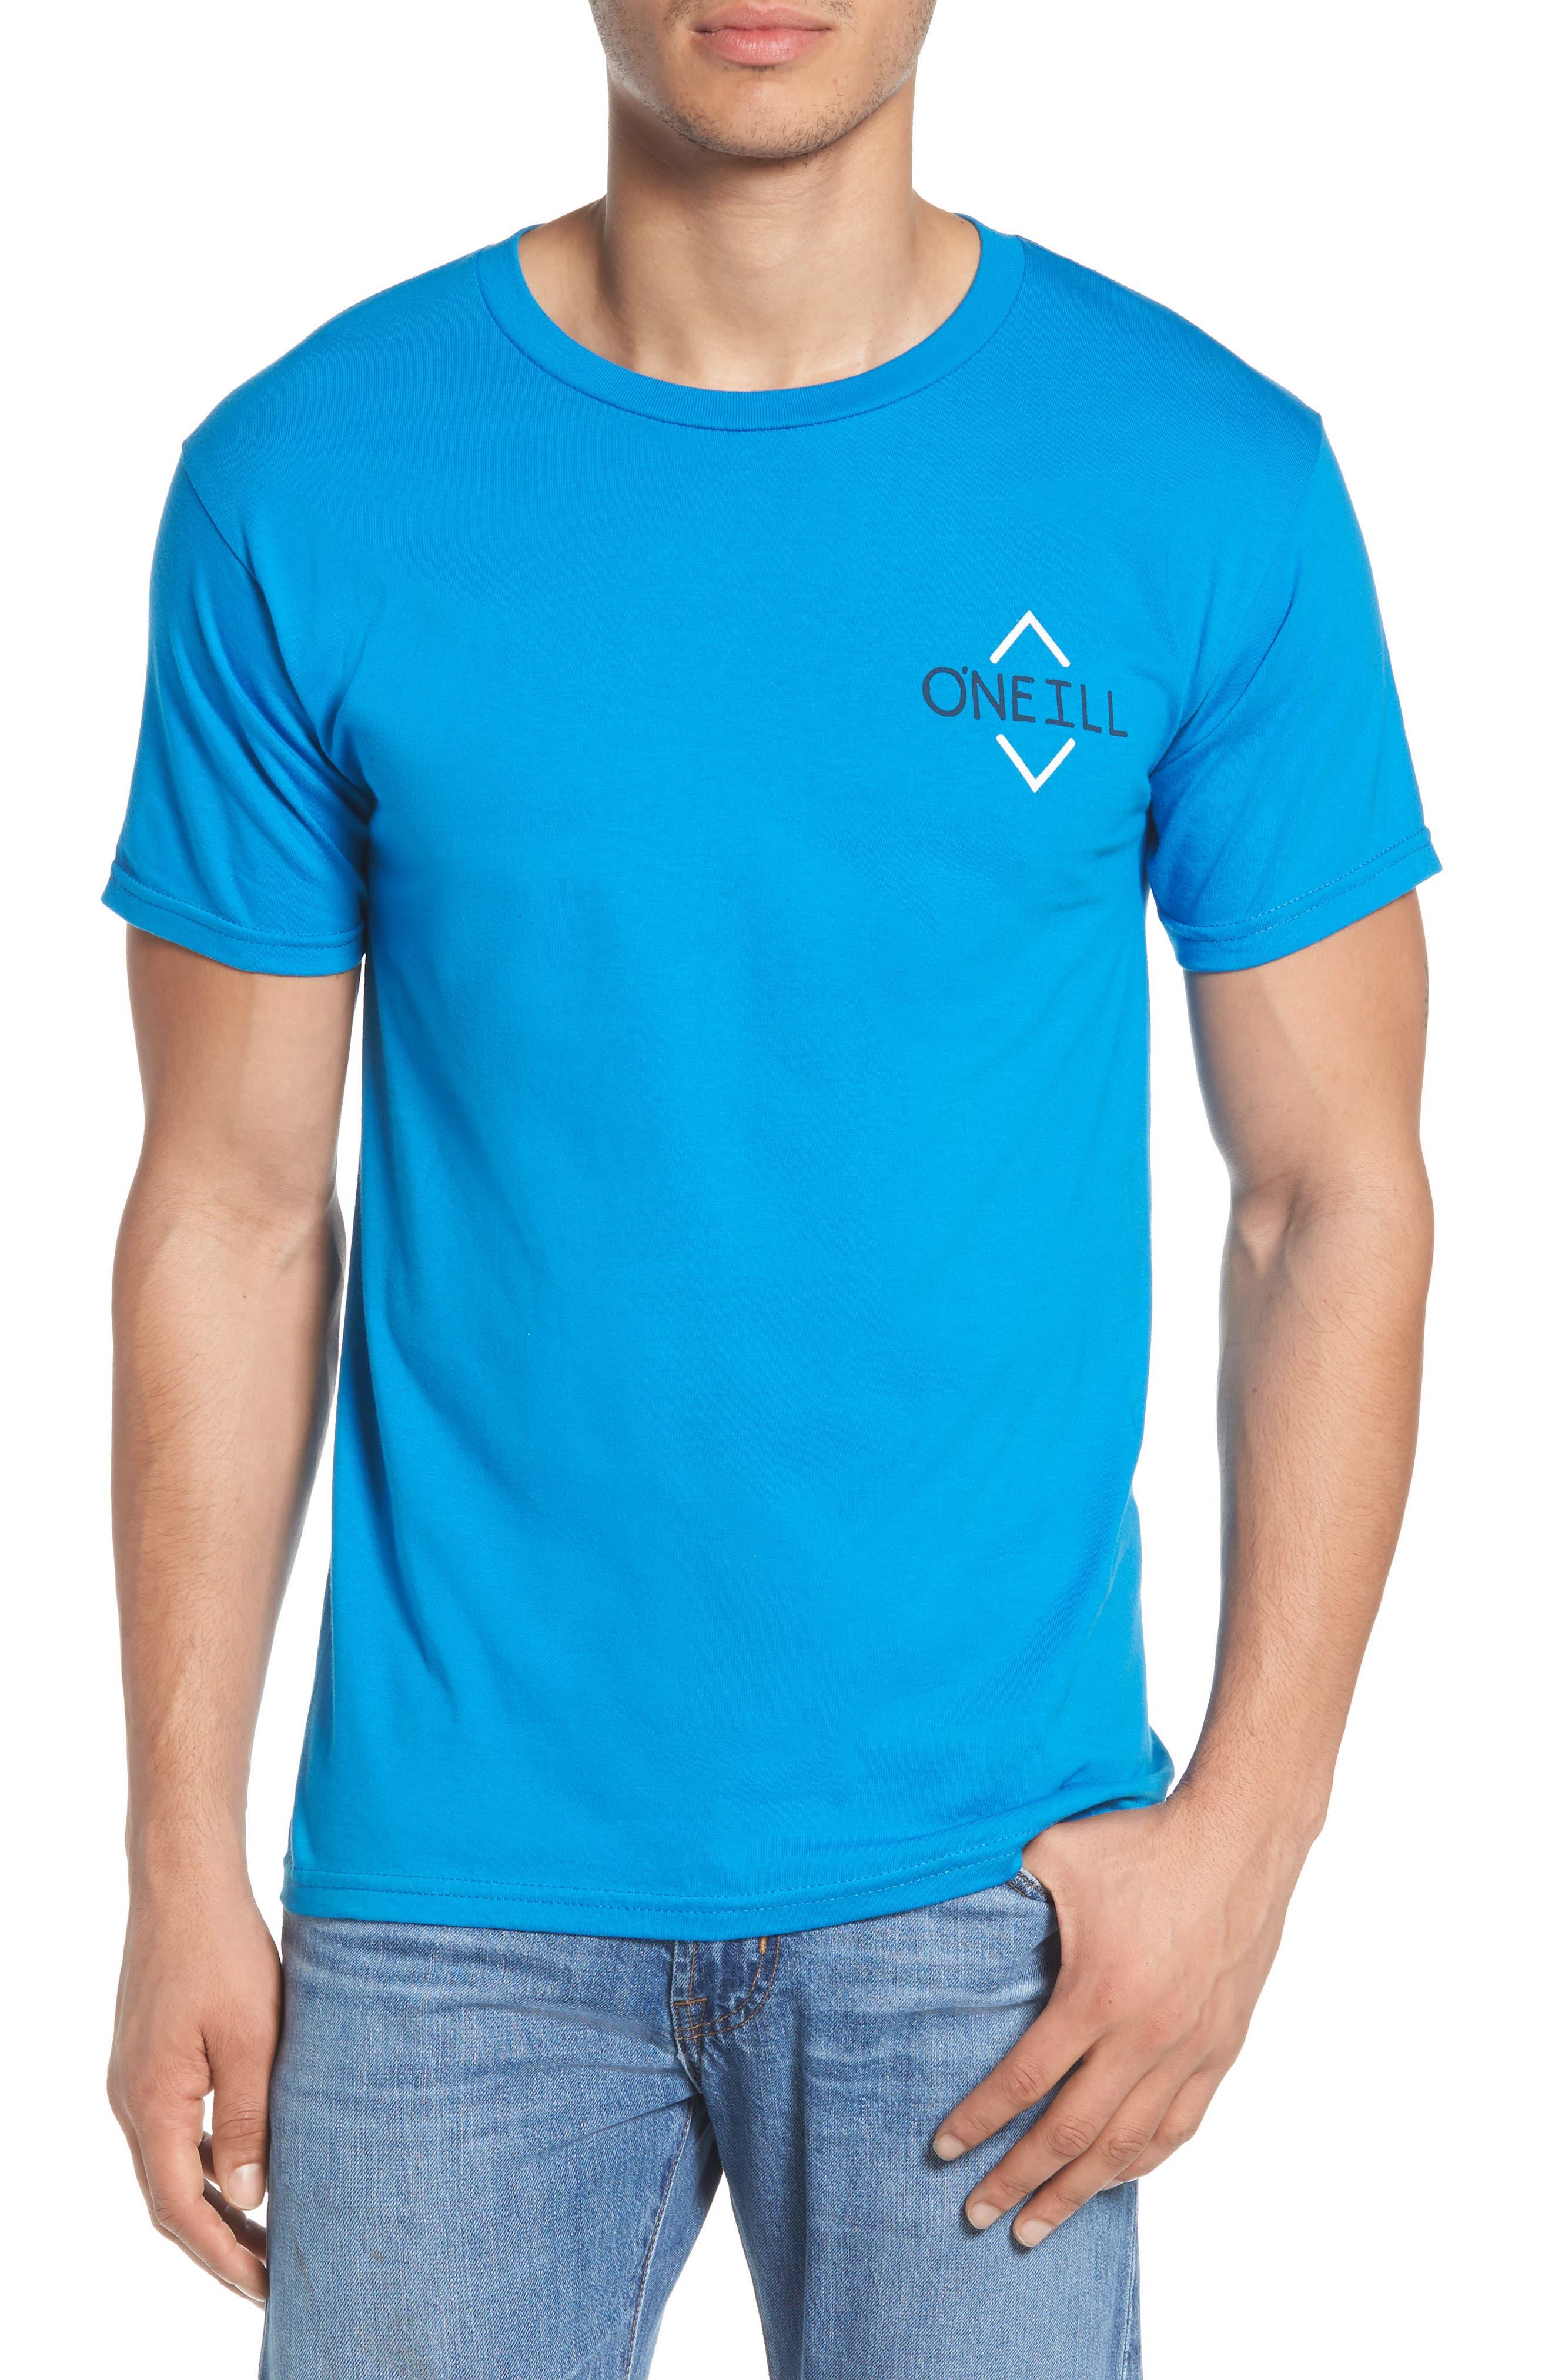 Fisher Graphic T-Shirt,                             Main thumbnail 1, color,                             Brilliant Blue